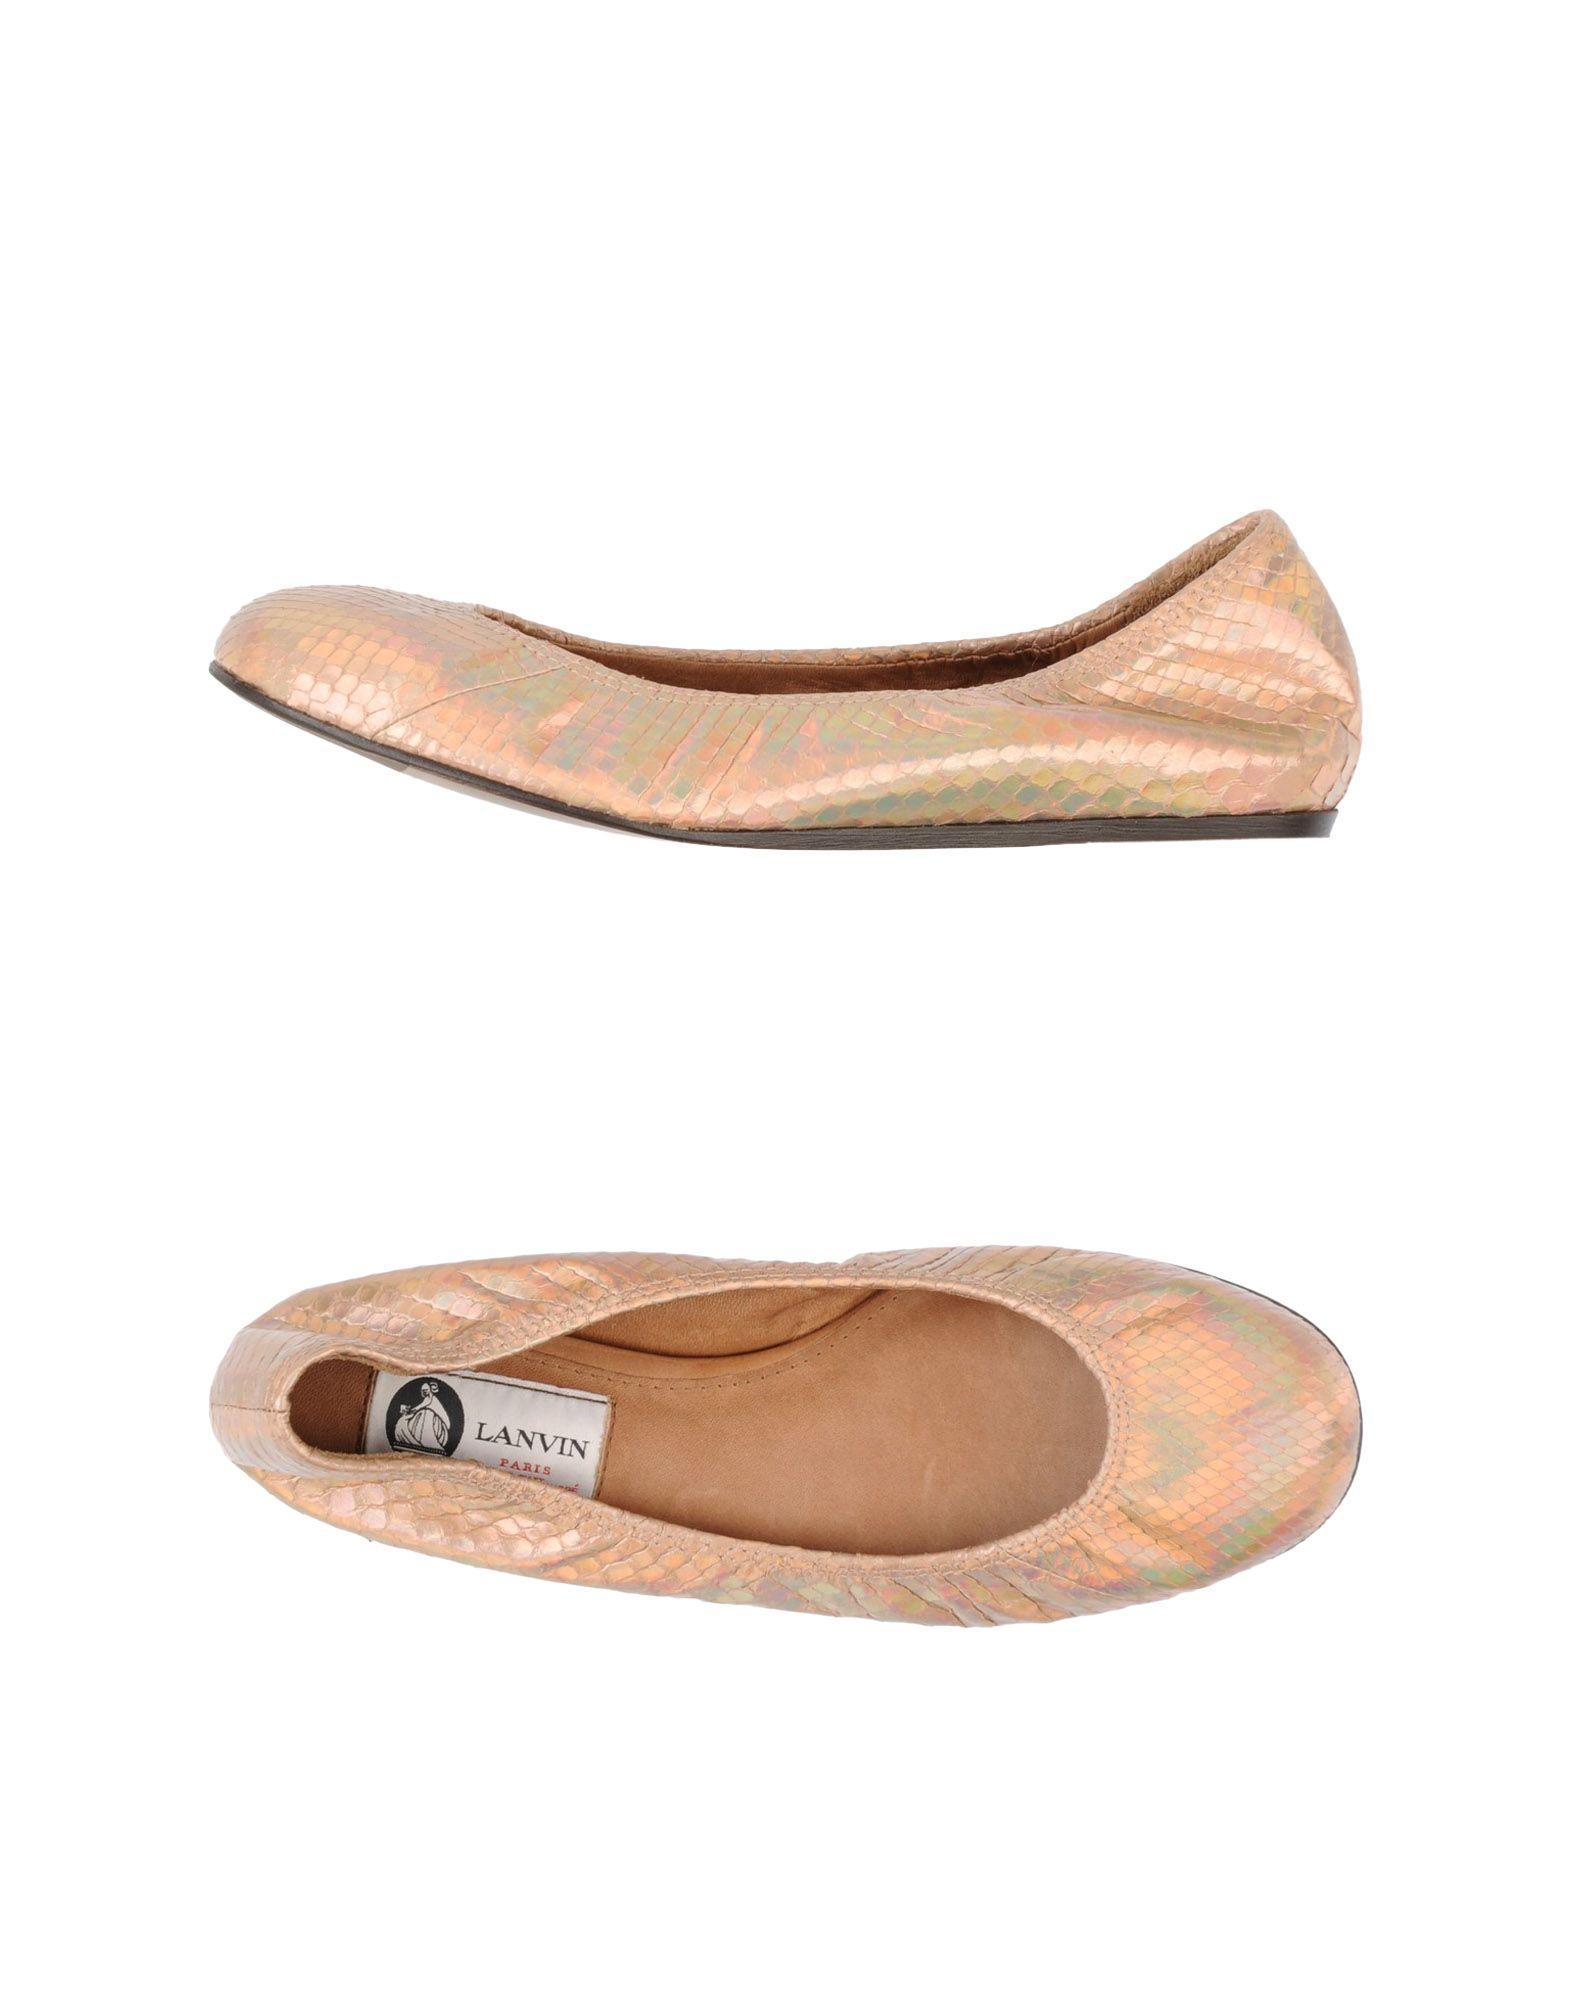 Lanvin Ballet Flats - Women Lanvin Ballet Ballet Ballet Flats online on  United Kingdom - 44598380KF 4215a6